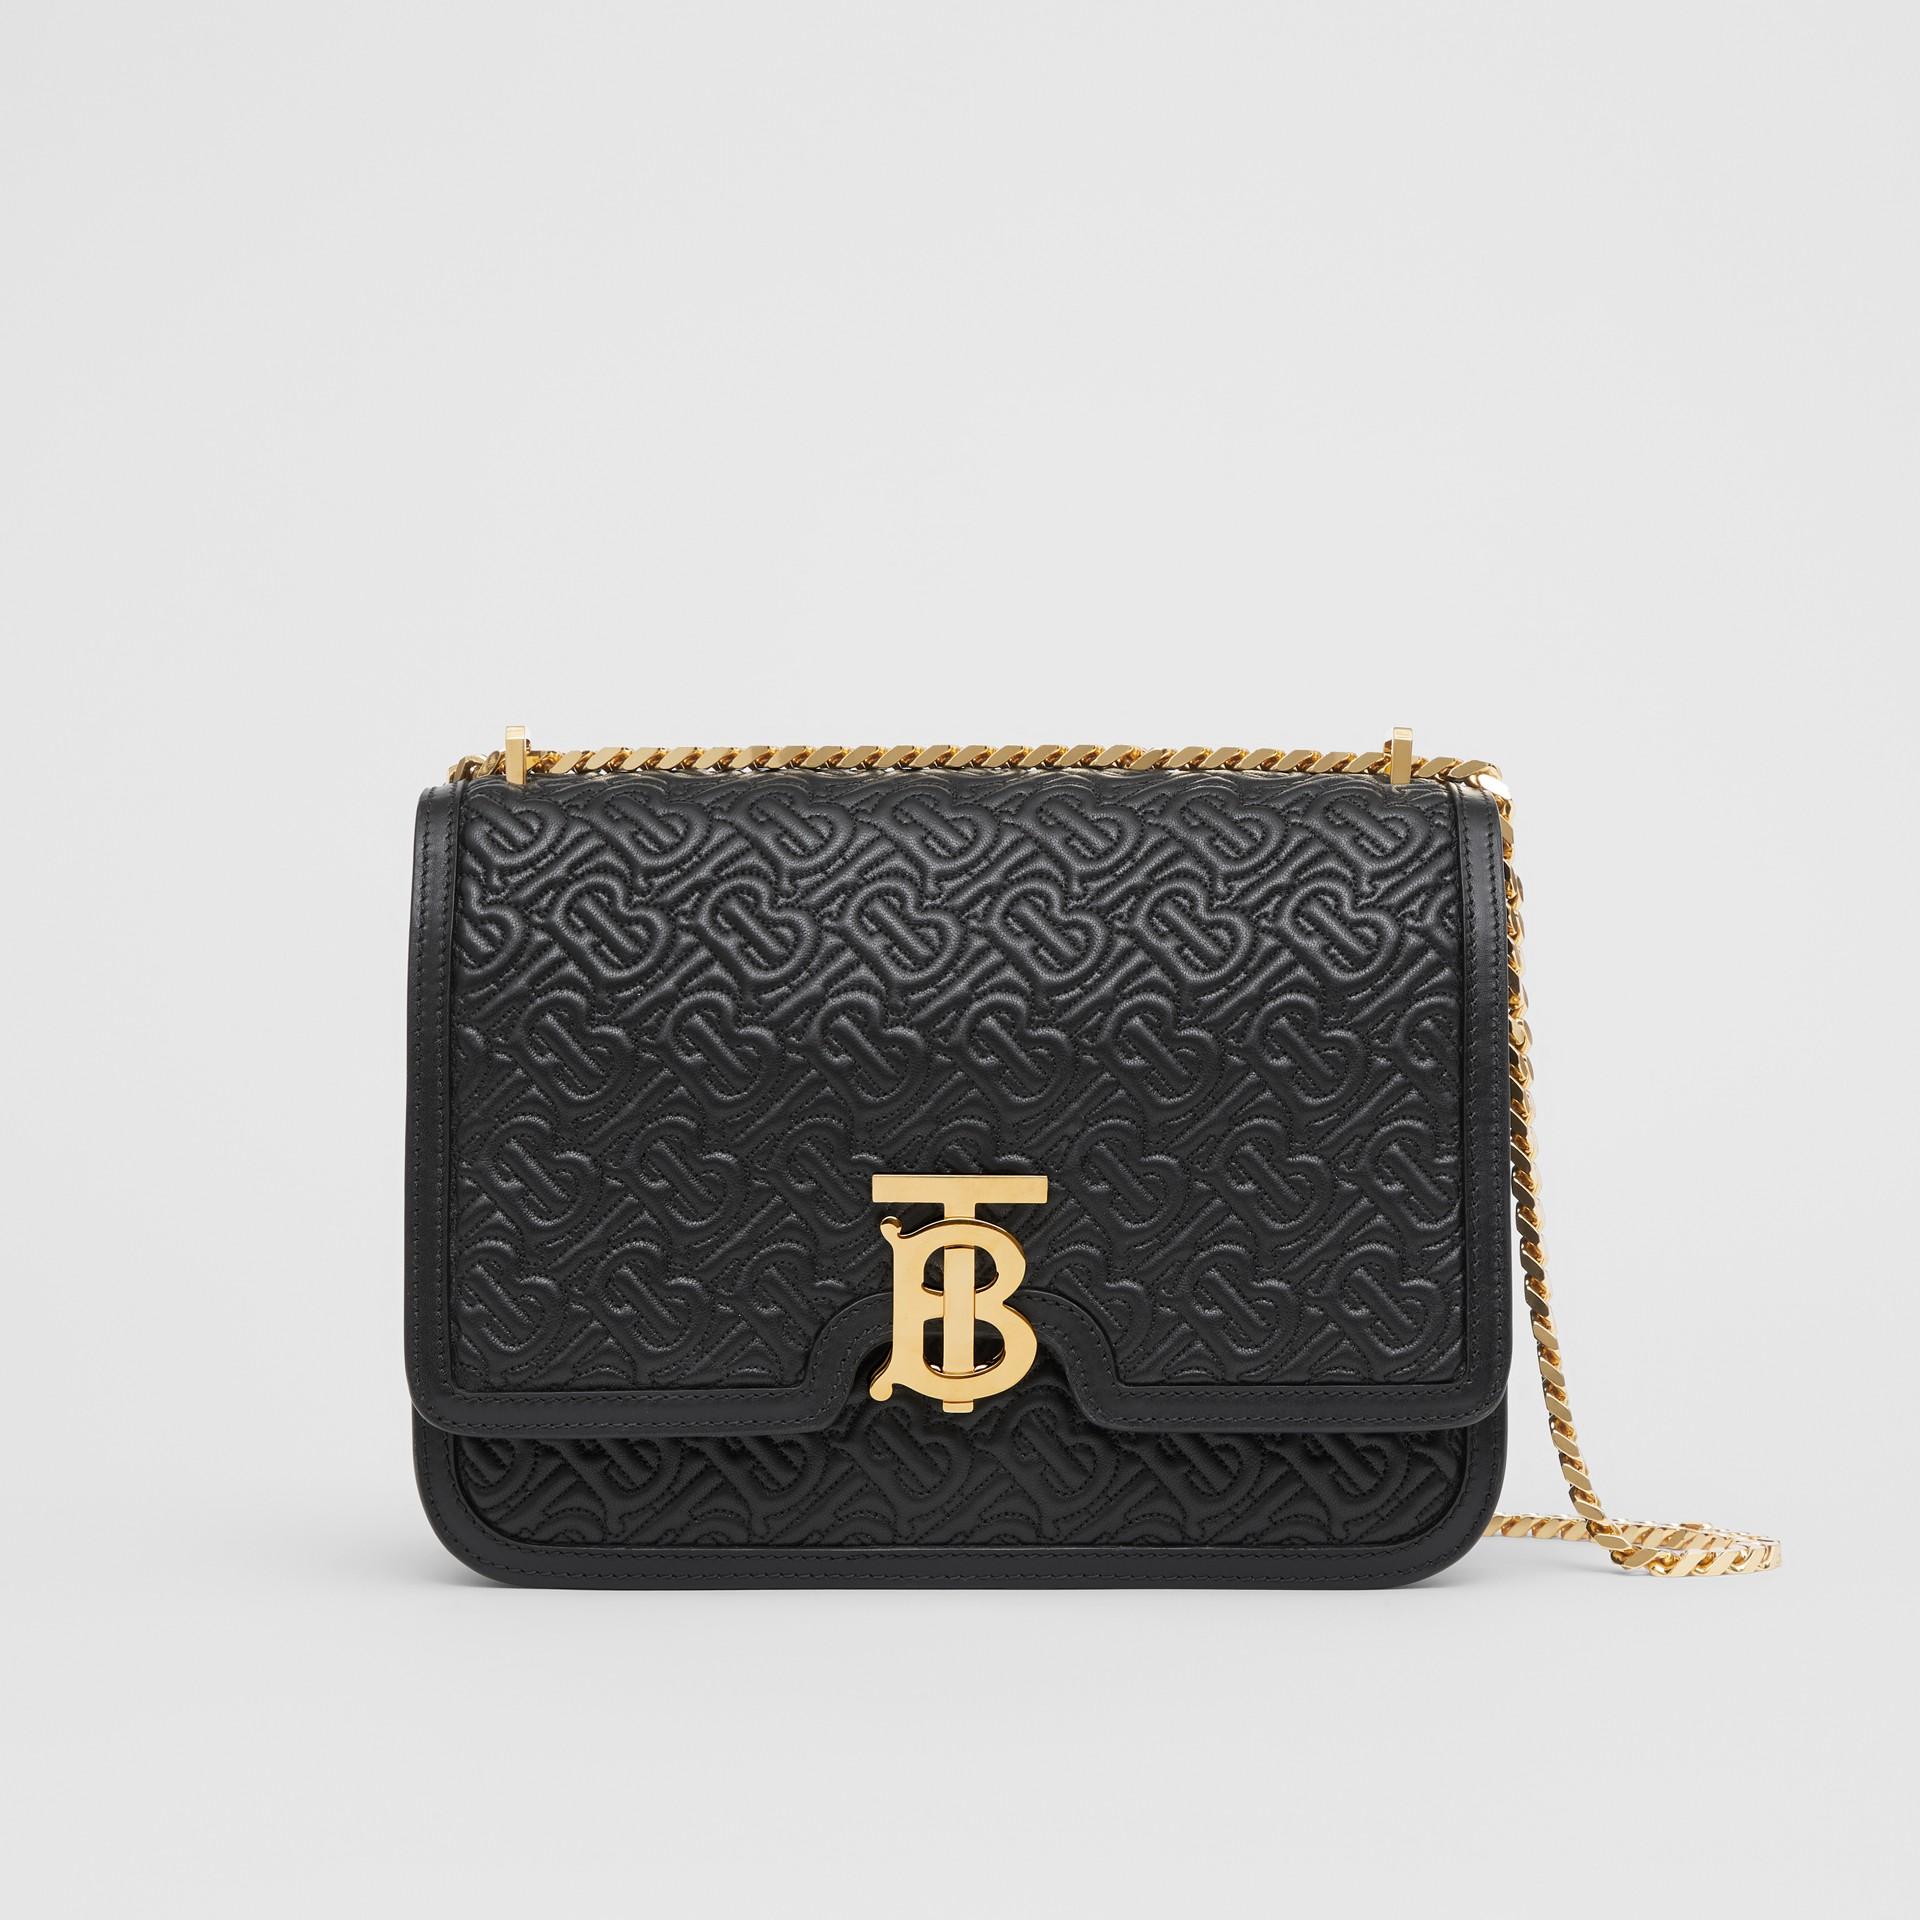 Medium Quilted Monogram Lambskin TB Bag in Black - Women | Burberry - gallery image 0